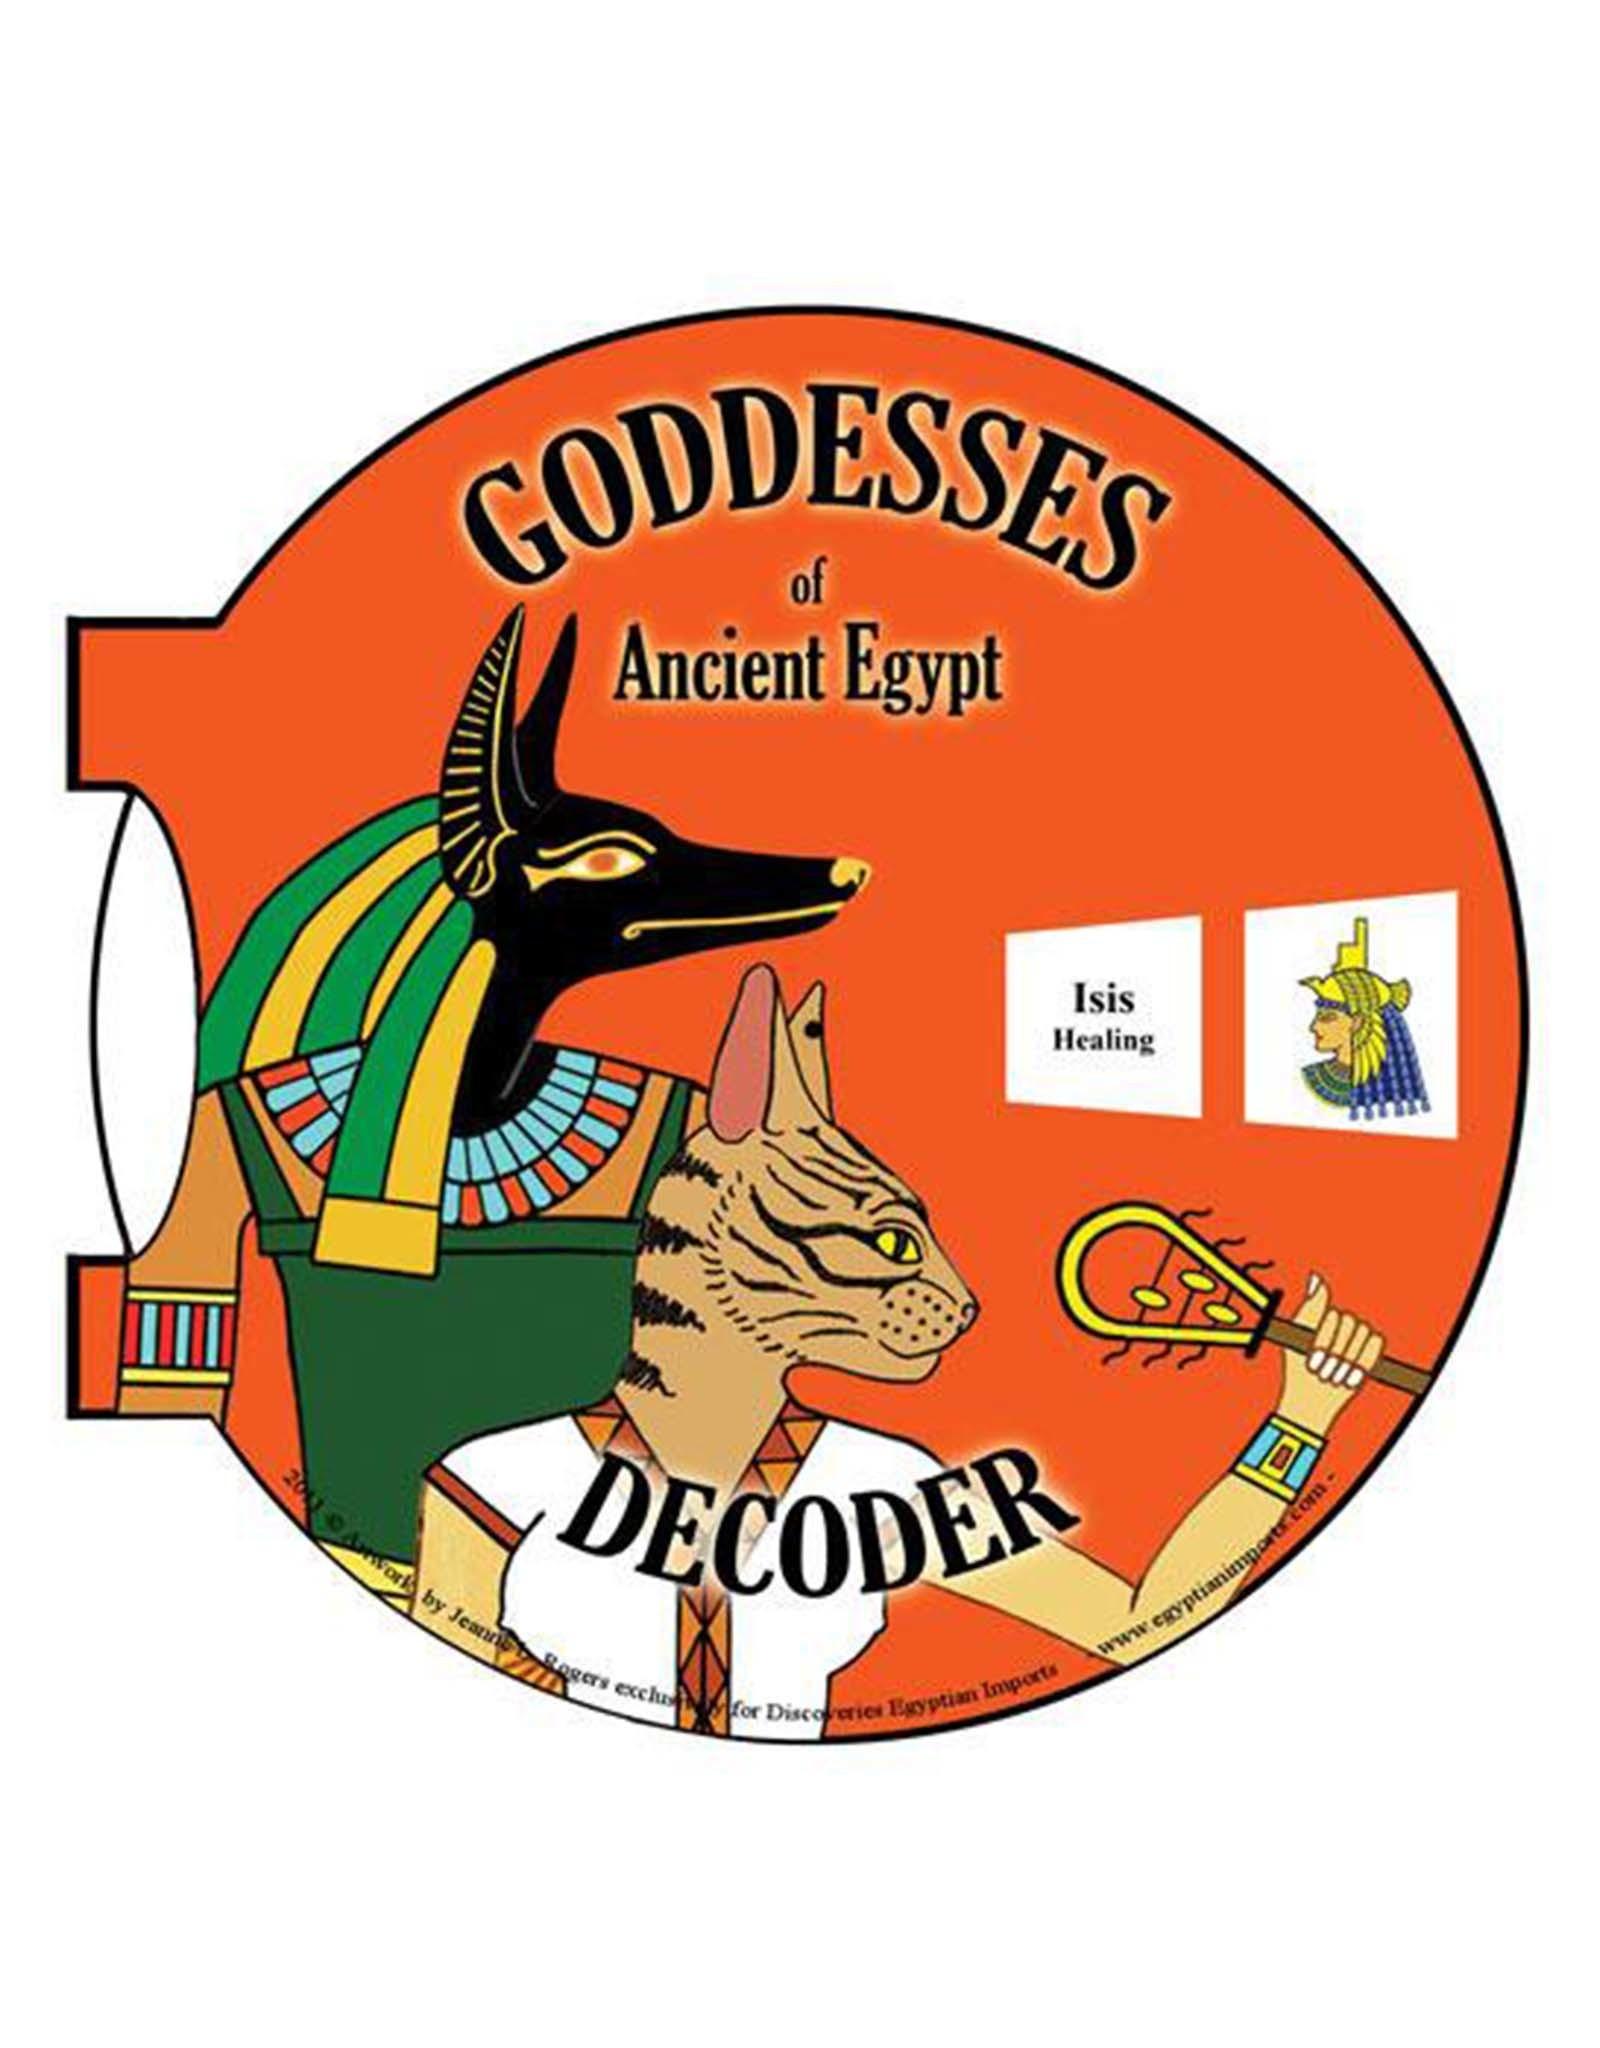 Hieroglyphic Decoder Gods and Goddesses